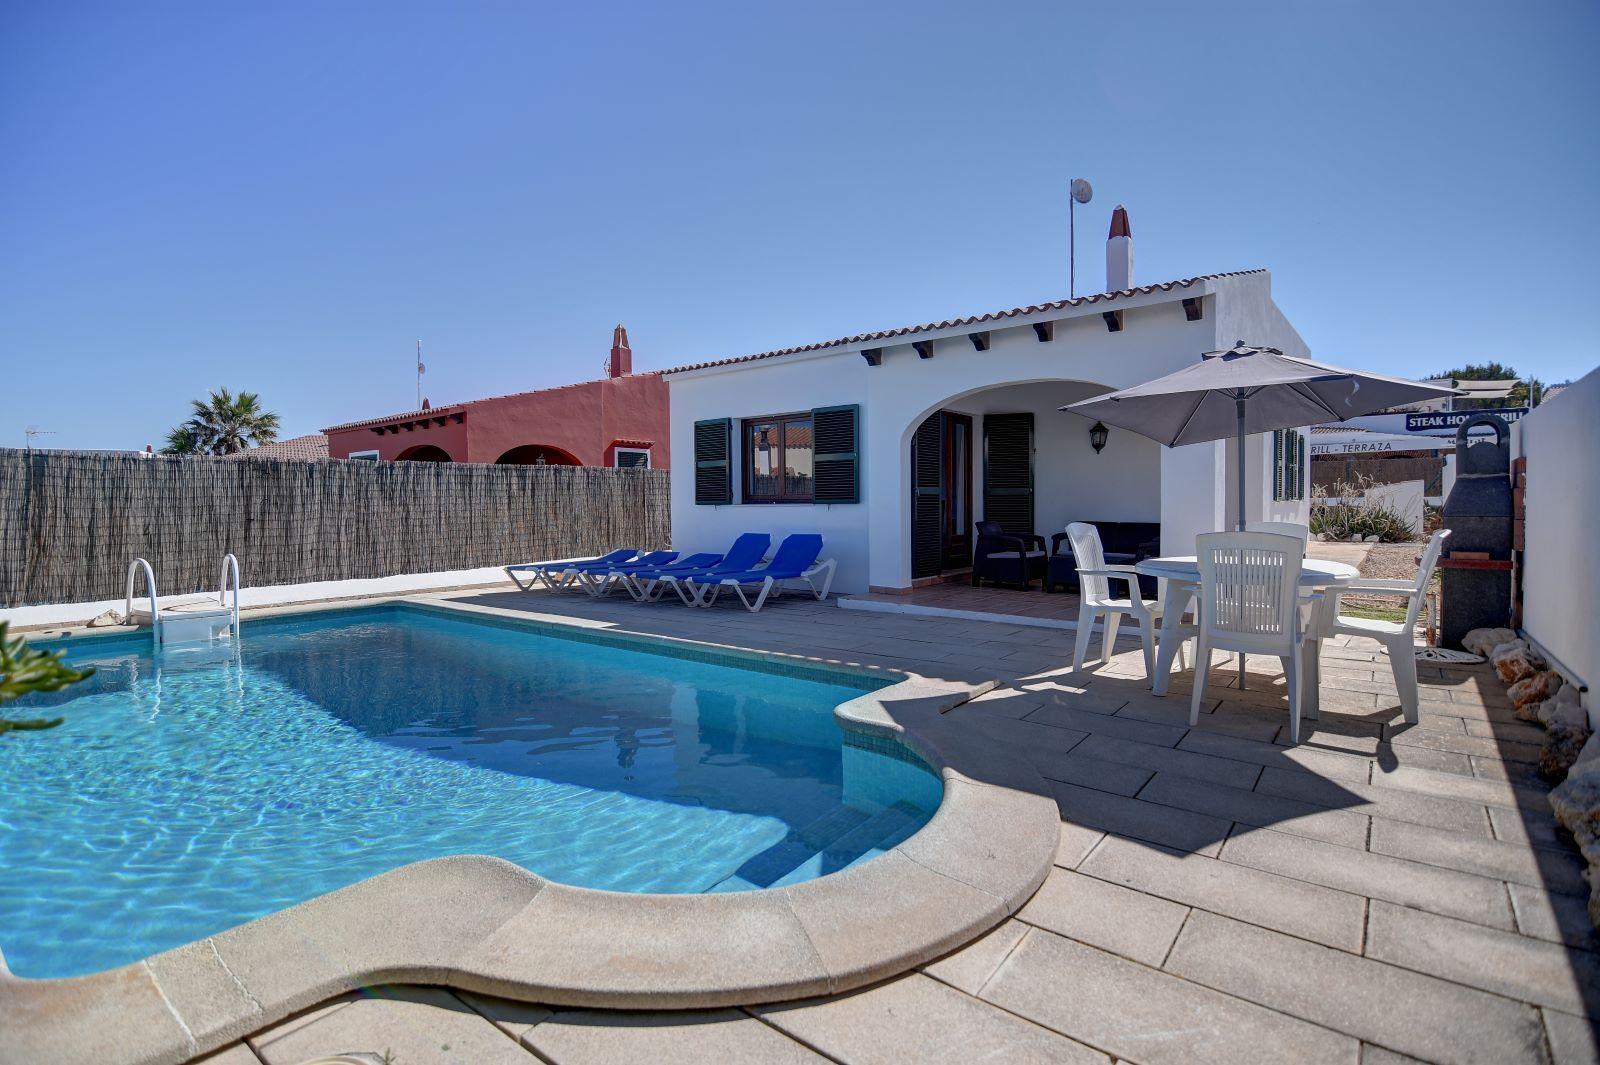 Villa in Cap D'Artruitx Ref: H2589 1